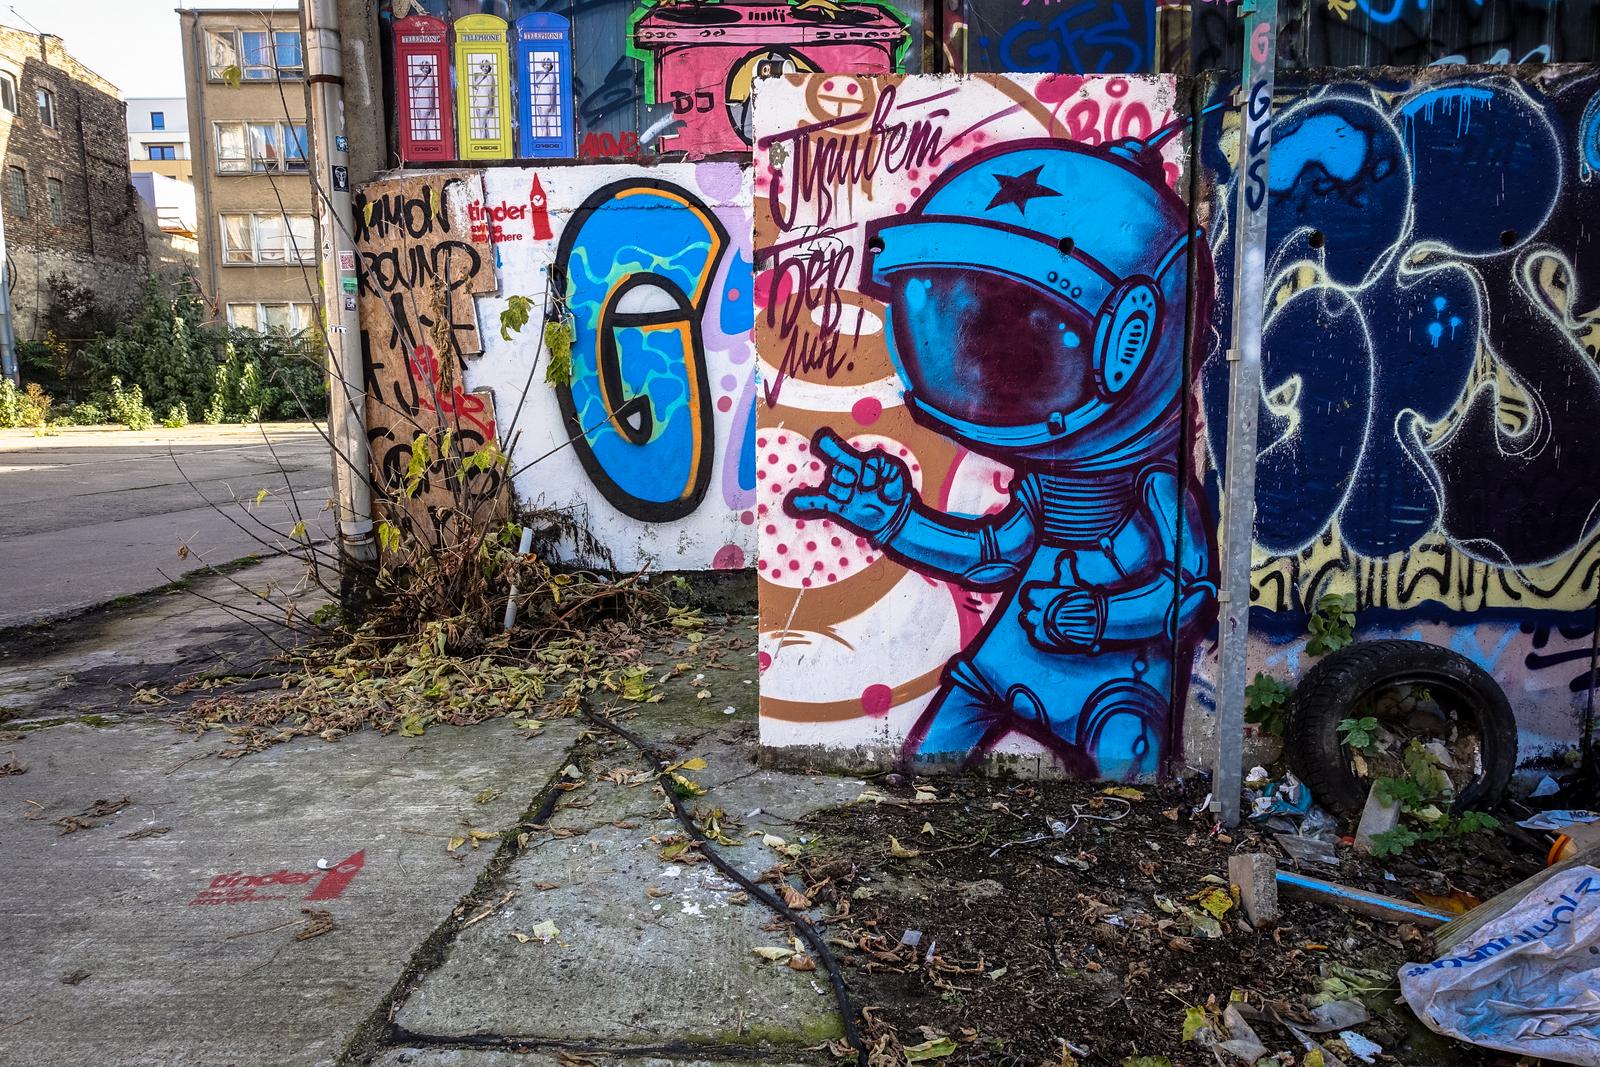 graffiti corner behind platoon, berlin